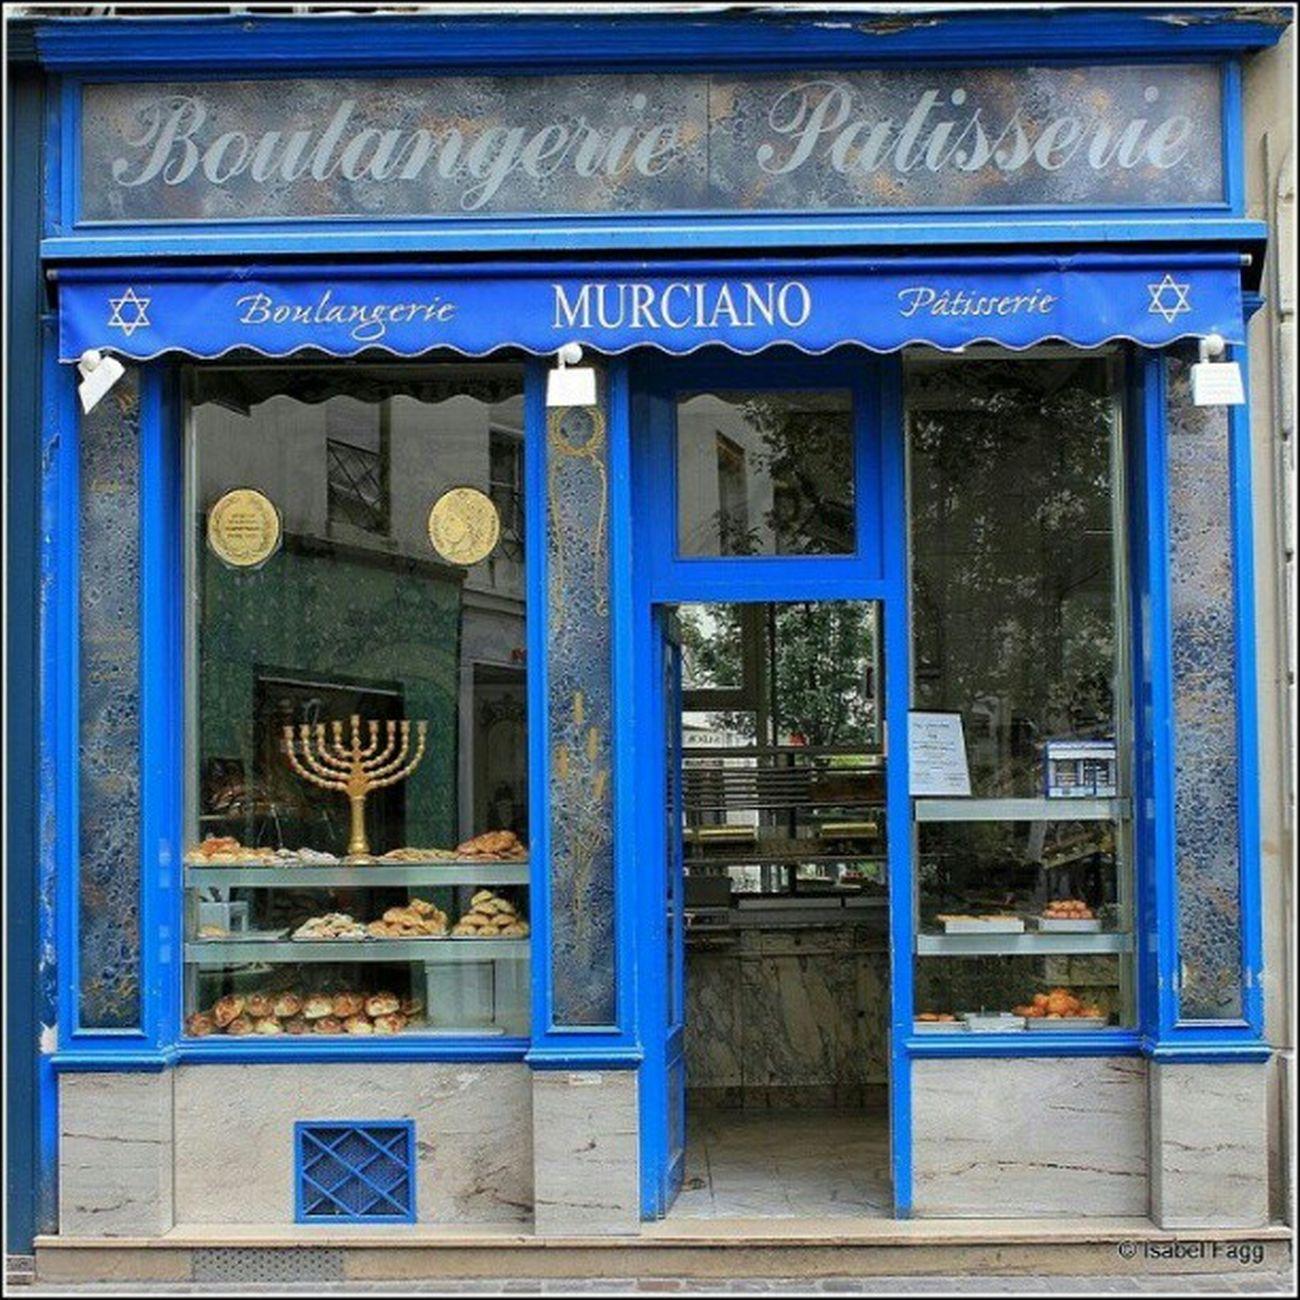 Jewish Bakery in LaMarias Paris France